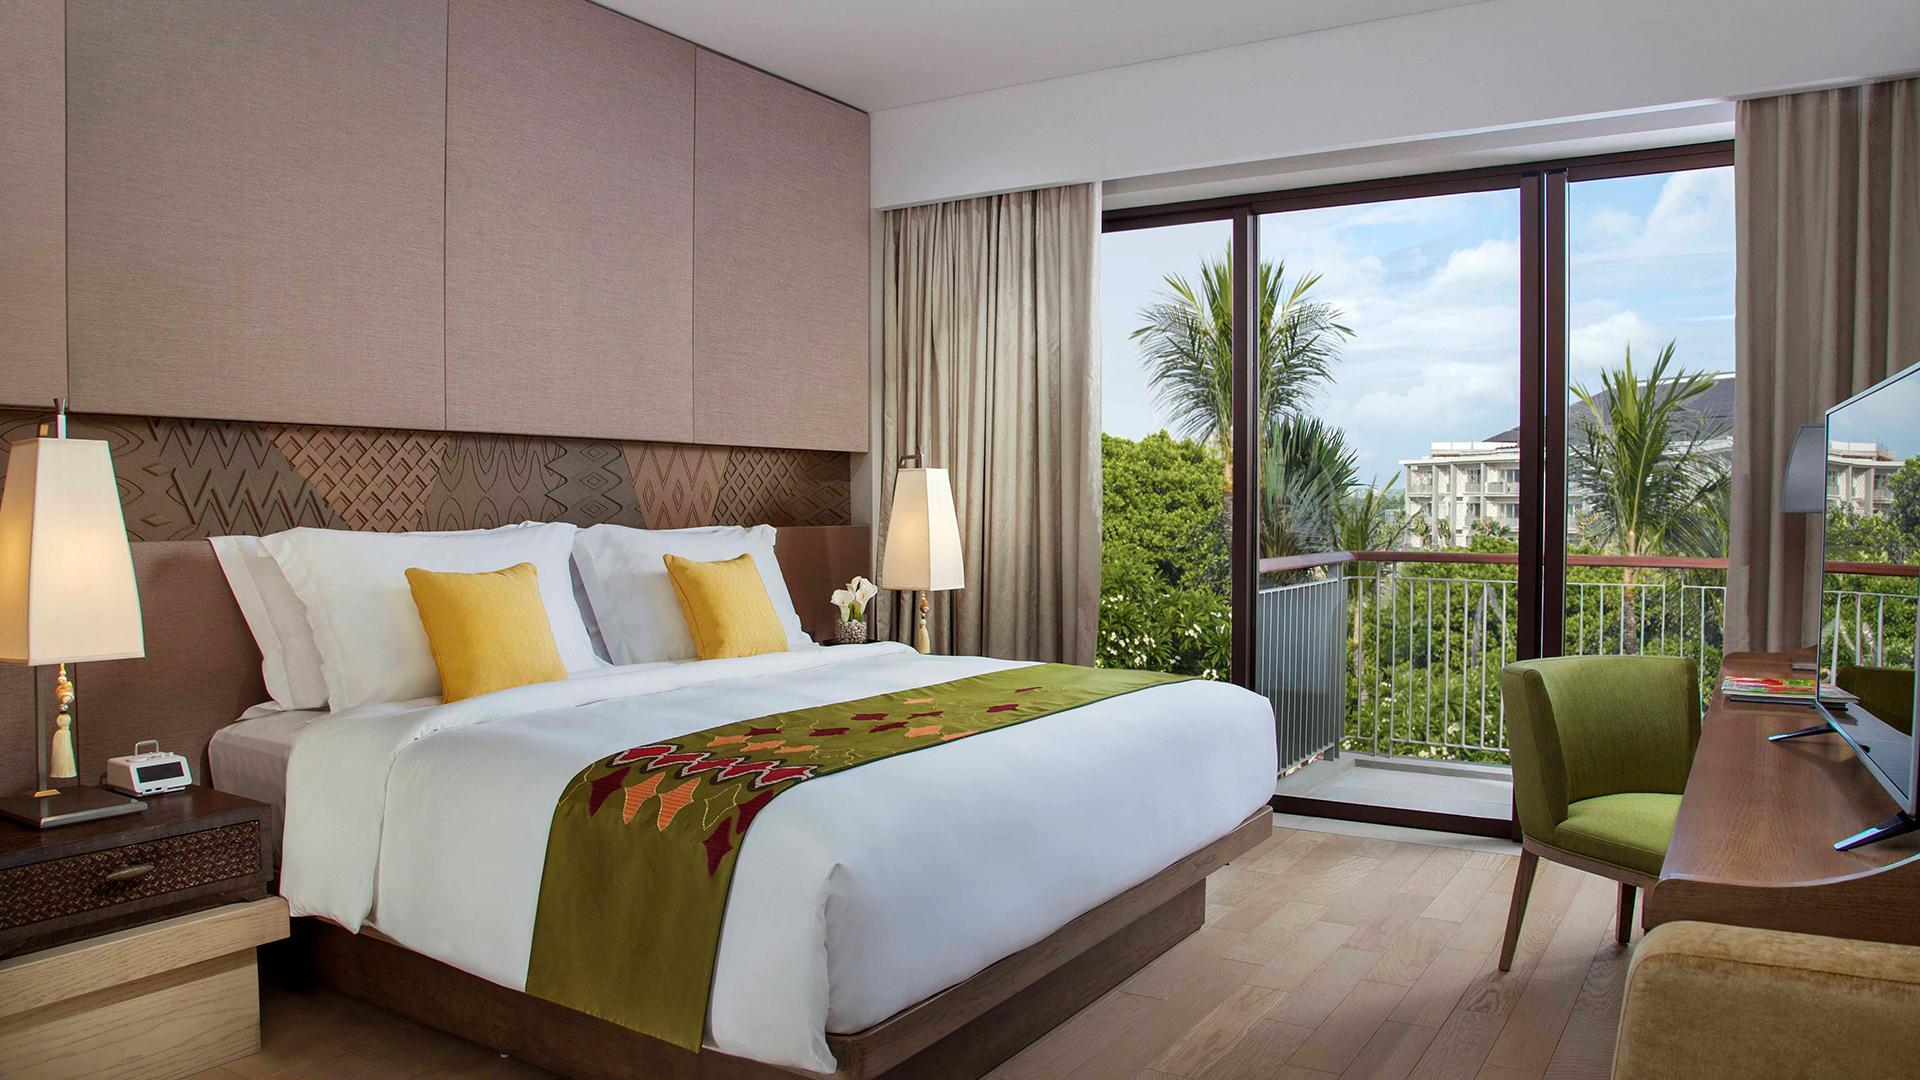 Classic Pool-View Room image 1 at Mövenpick Resort & Spa Jimbaran Bali by Kabupaten Badung, Bali, Indonesia